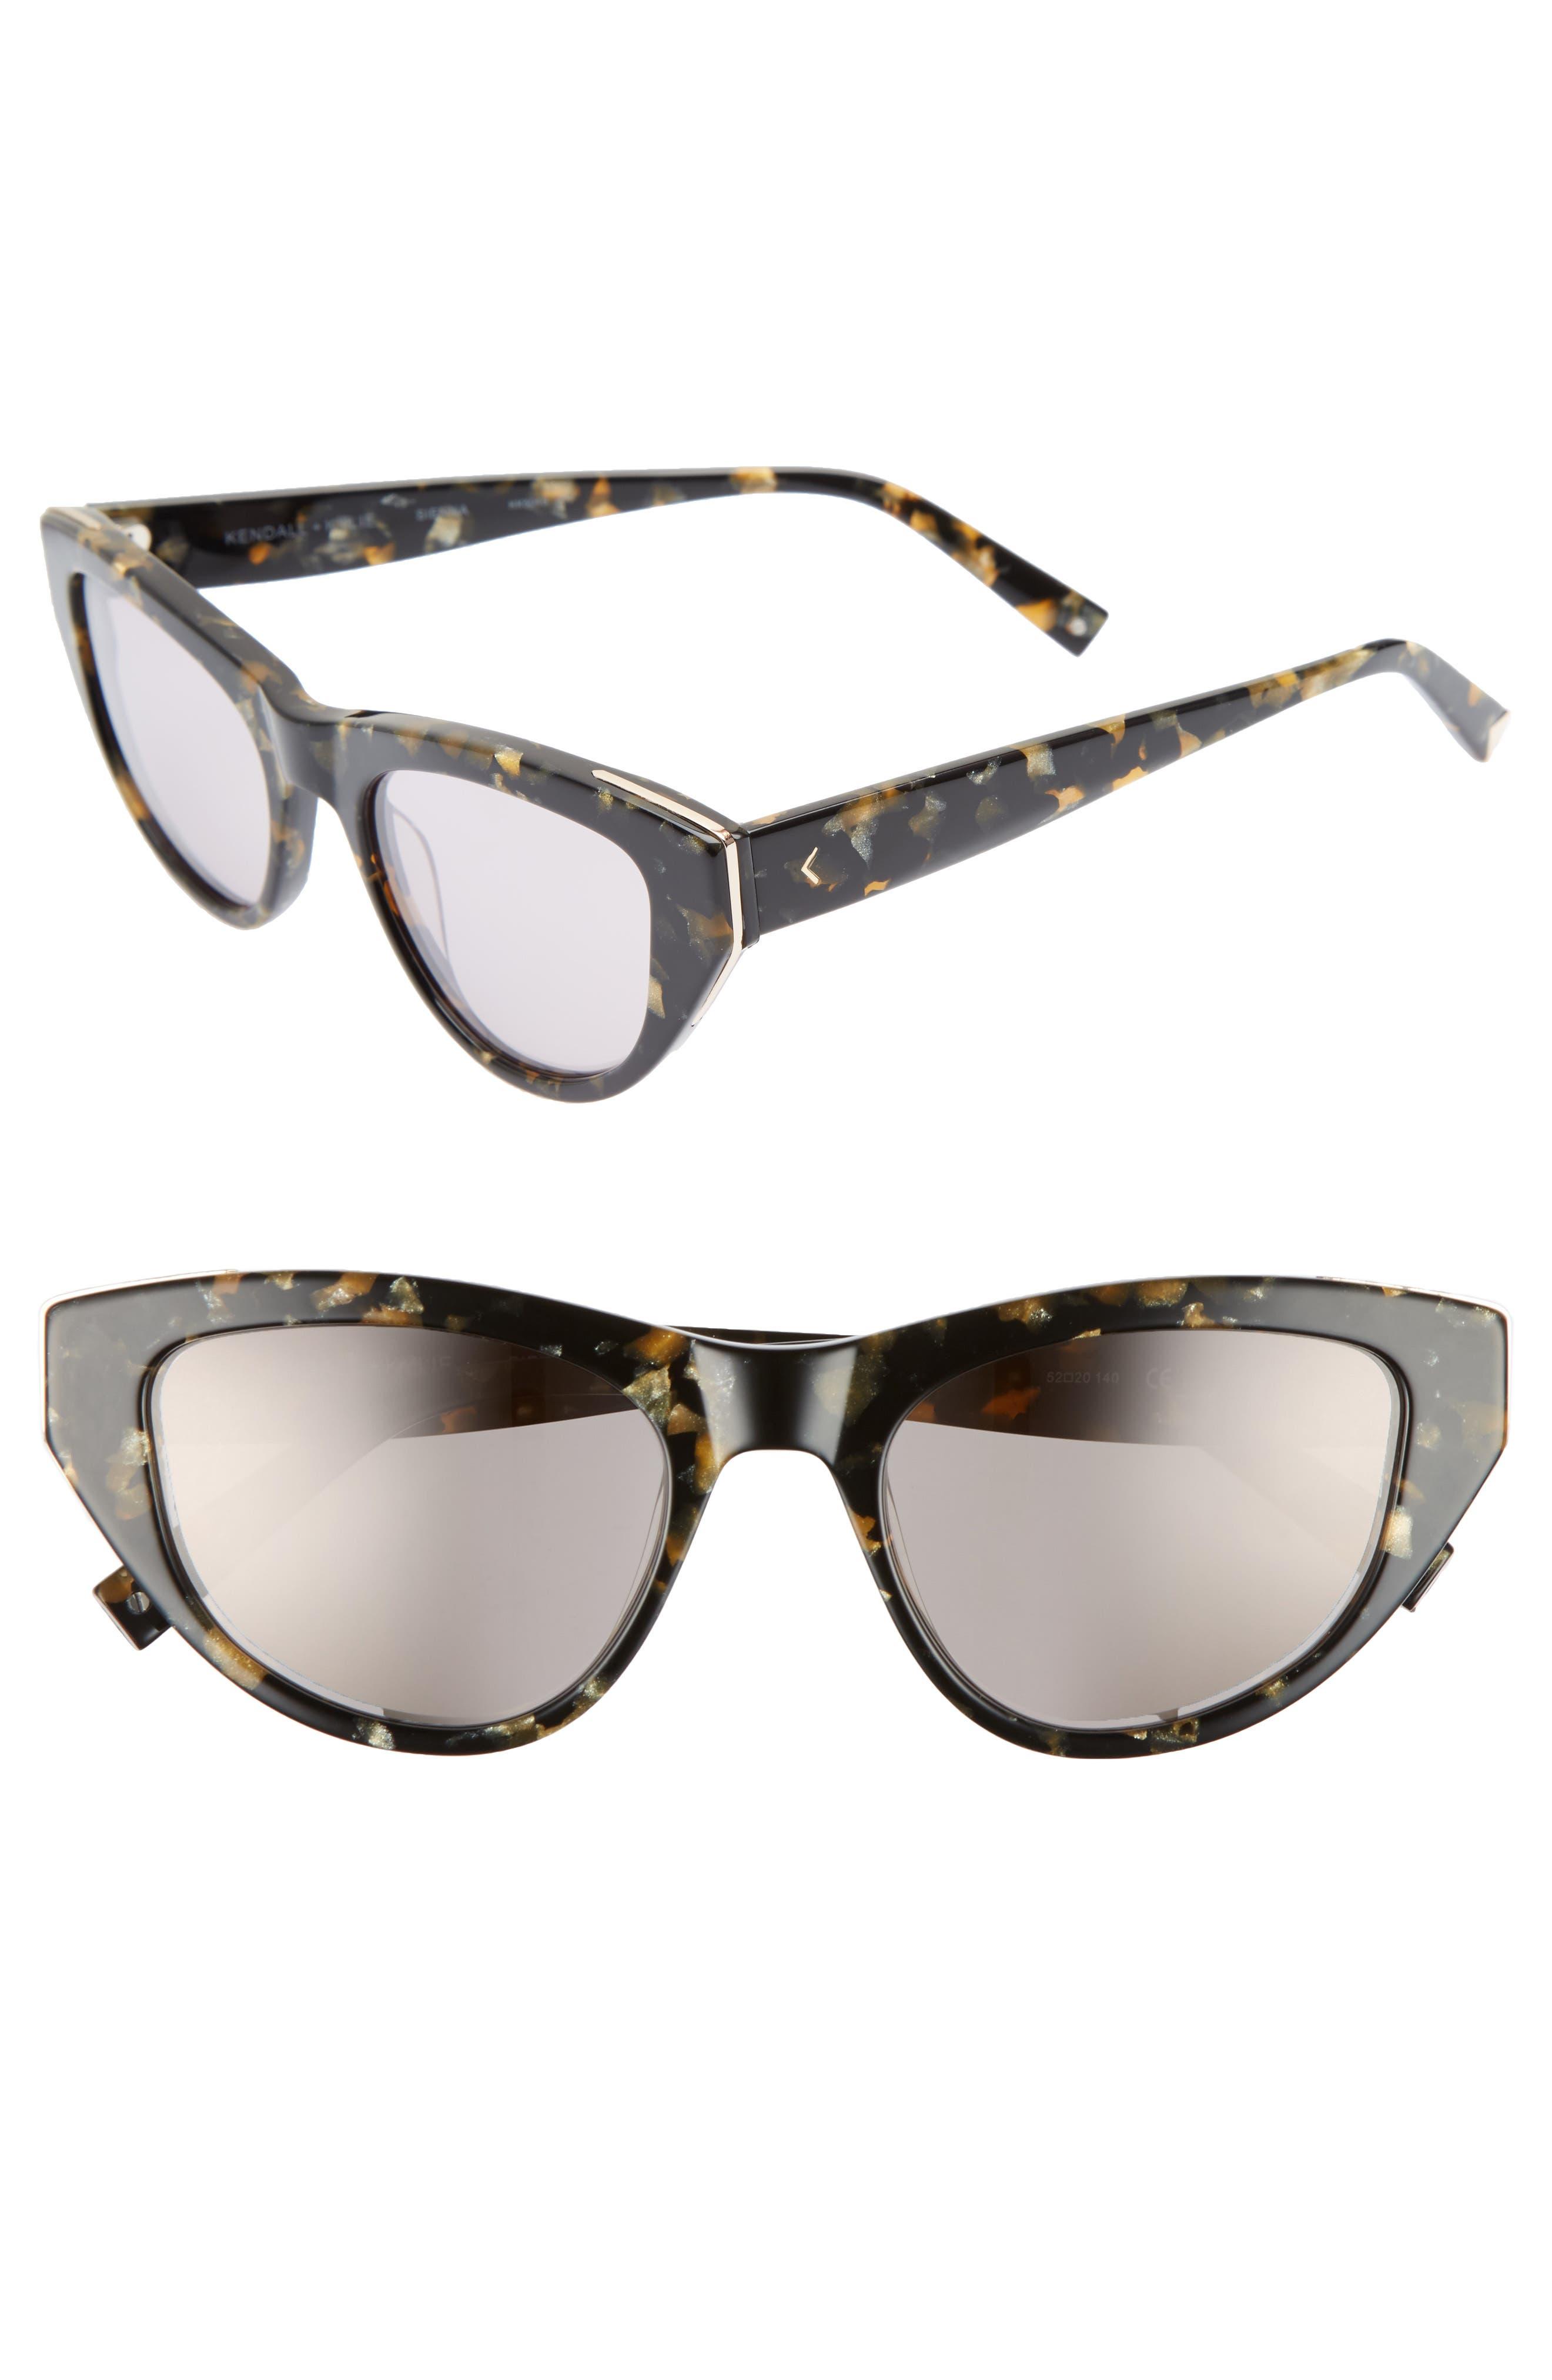 Sienna 52mm Retro Cat Eye Sunglasses,                         Main,                         color,